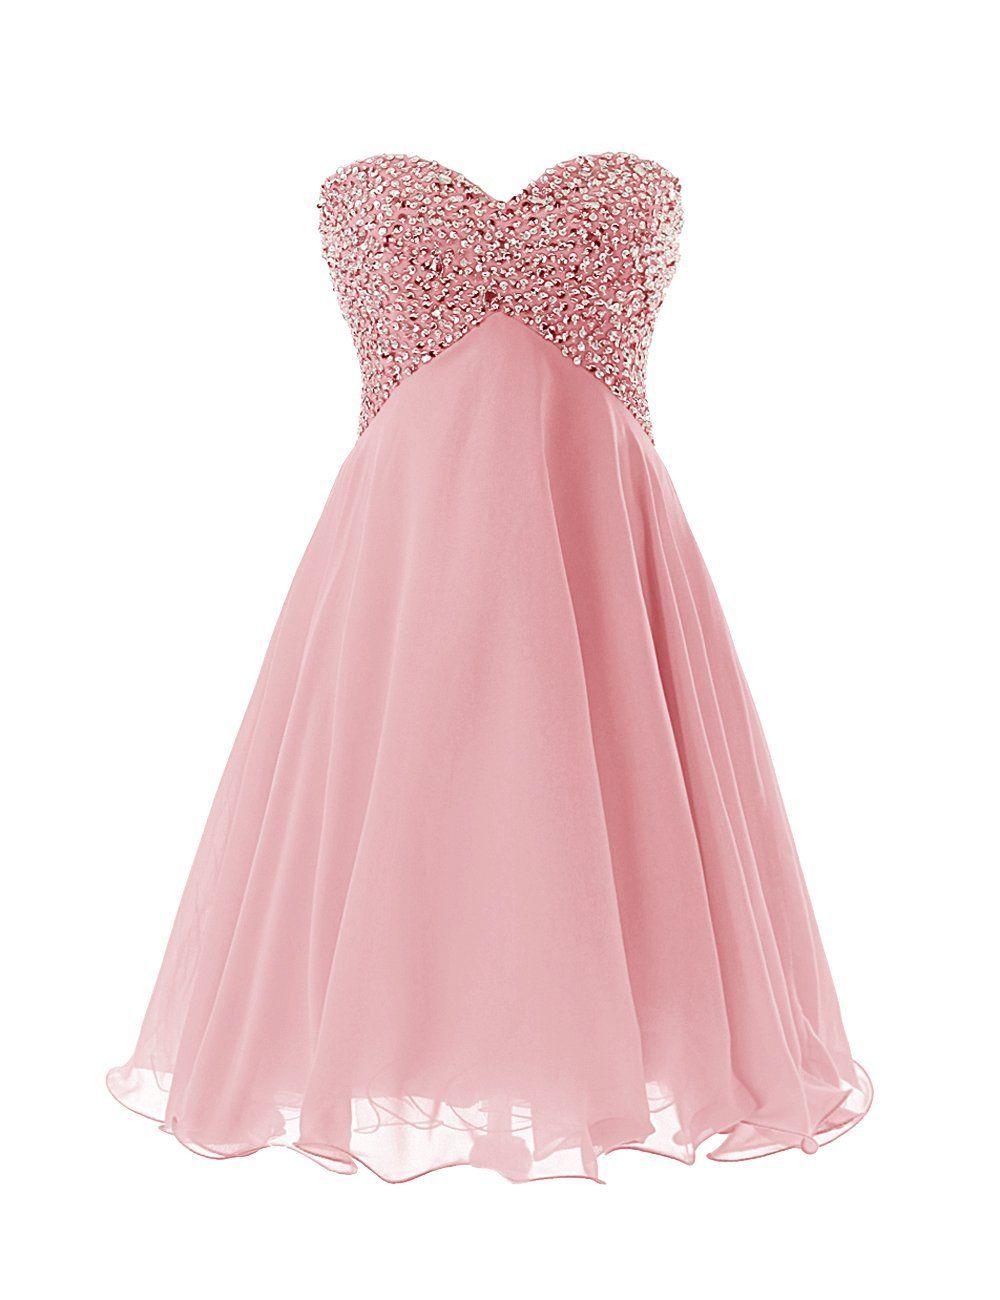 Pin de Miranda Maas en Prom dress | Pinterest | La novia, Mamá y ...